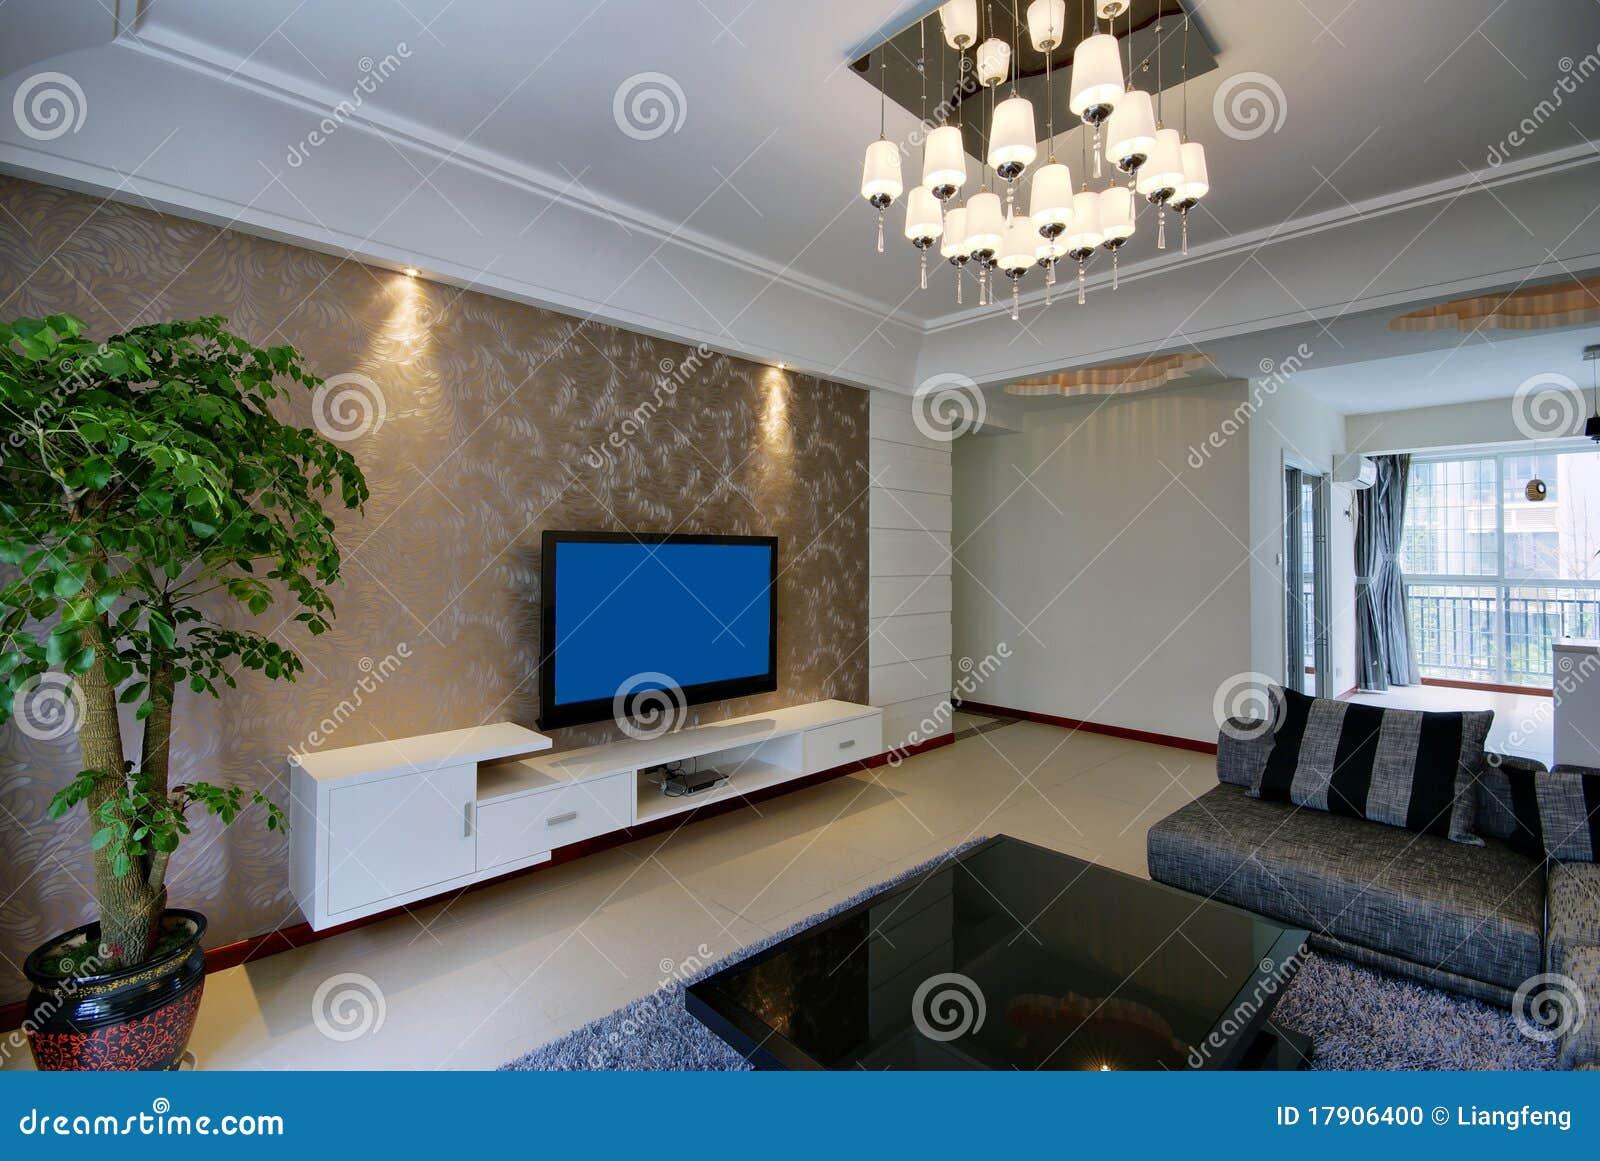 New Room Decoration Modern Stock Photo Image 17906400